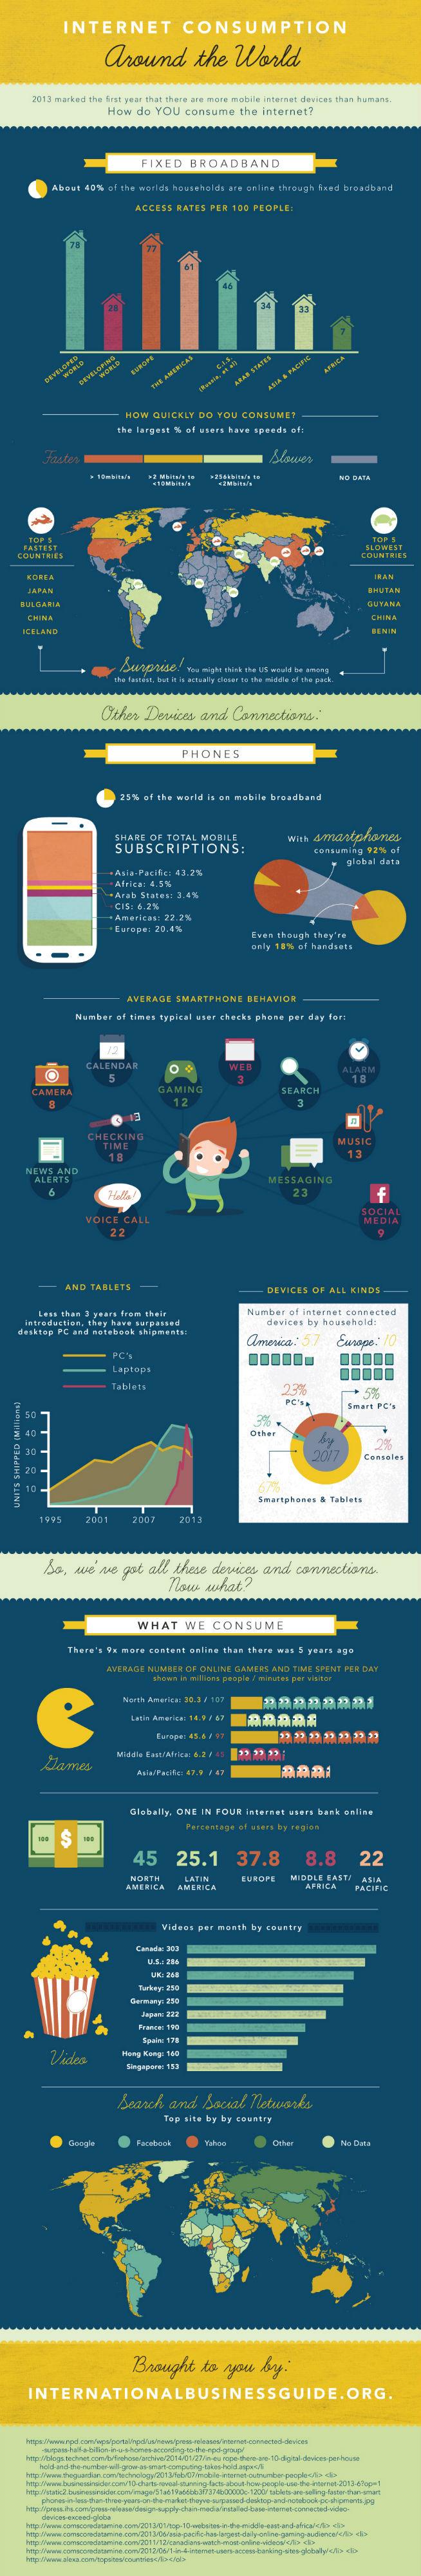 Internet Consumption Around the World [Infographic]